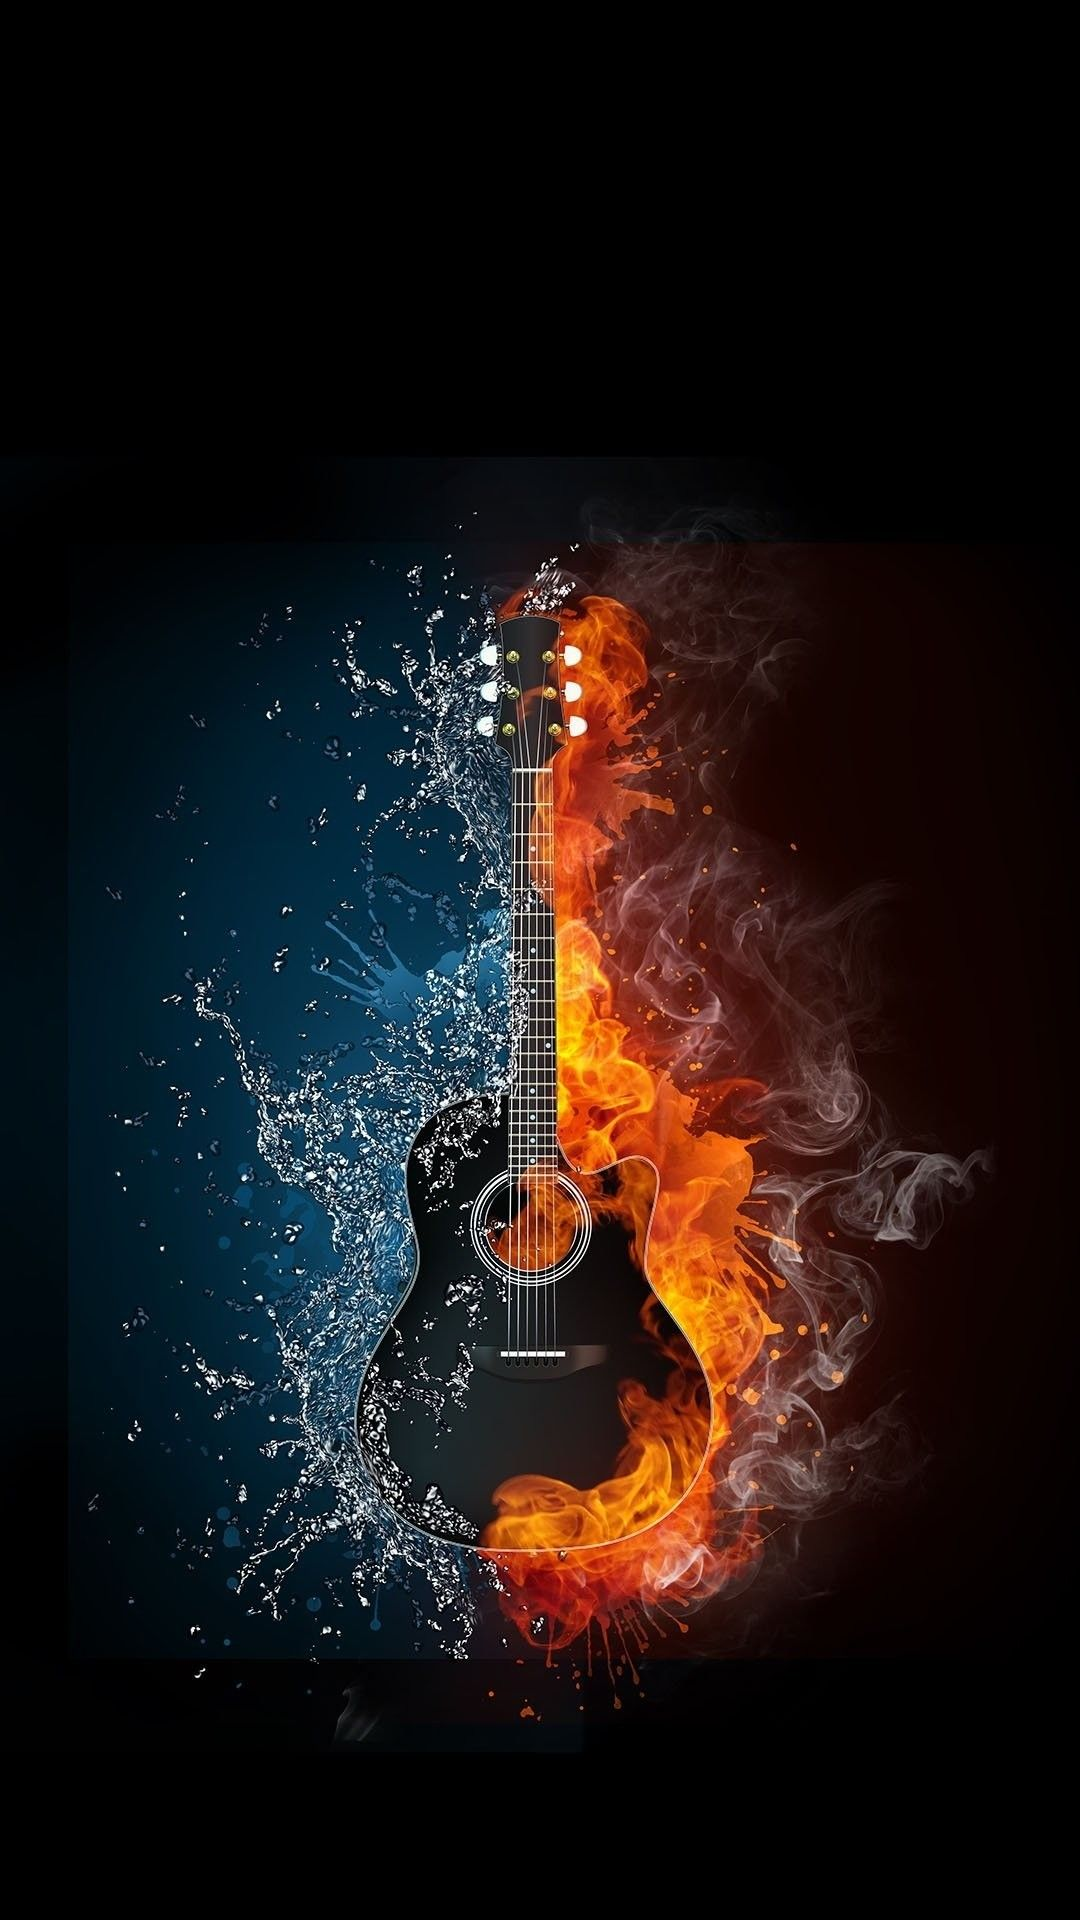 pin by nikhil kharbanda on wallpapers 4k hd in 2019 guitar fender stratocaster music guitar. Black Bedroom Furniture Sets. Home Design Ideas